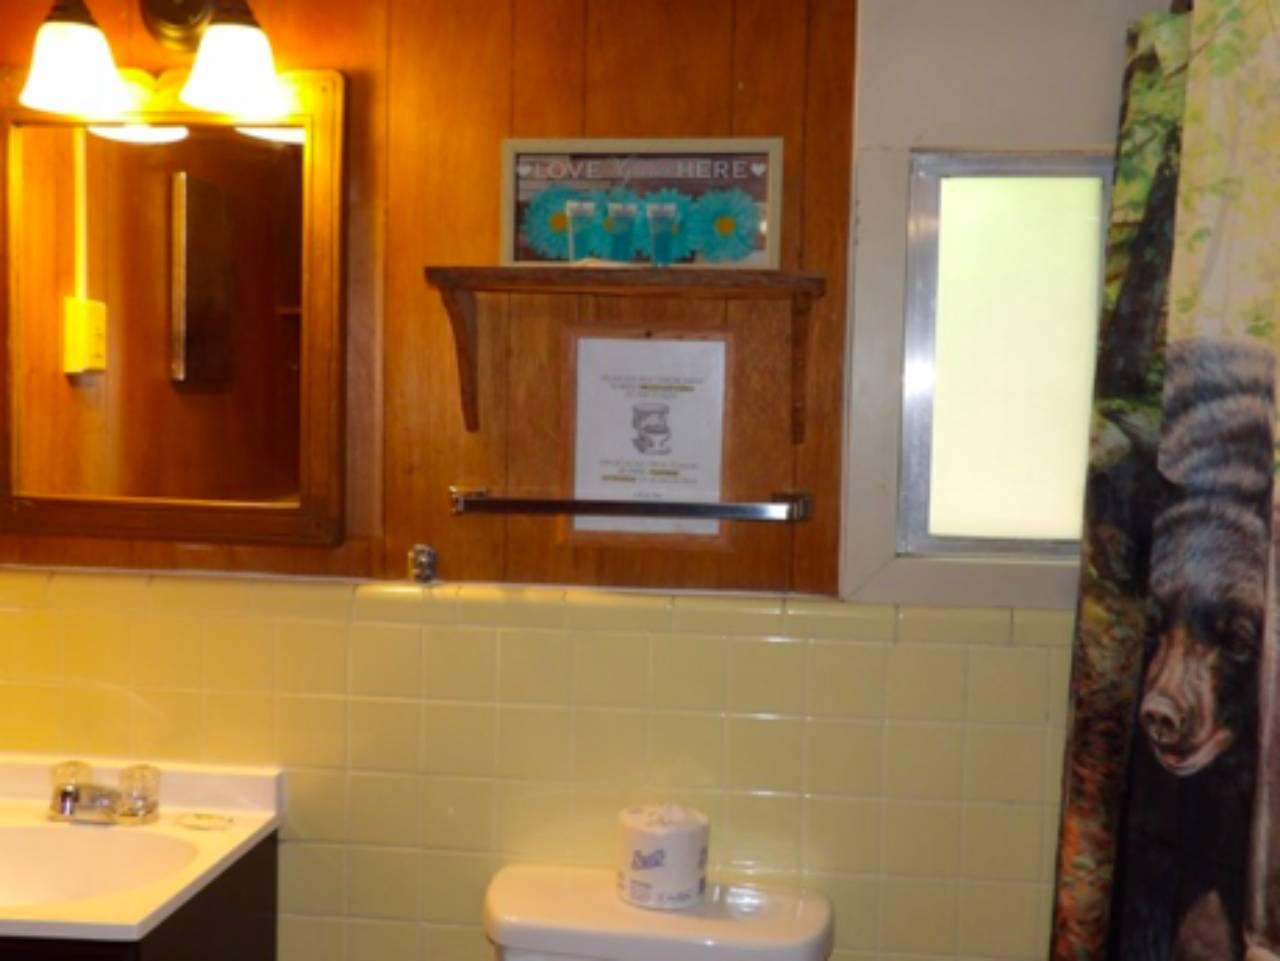 bathroom mirror, toilet, and lights